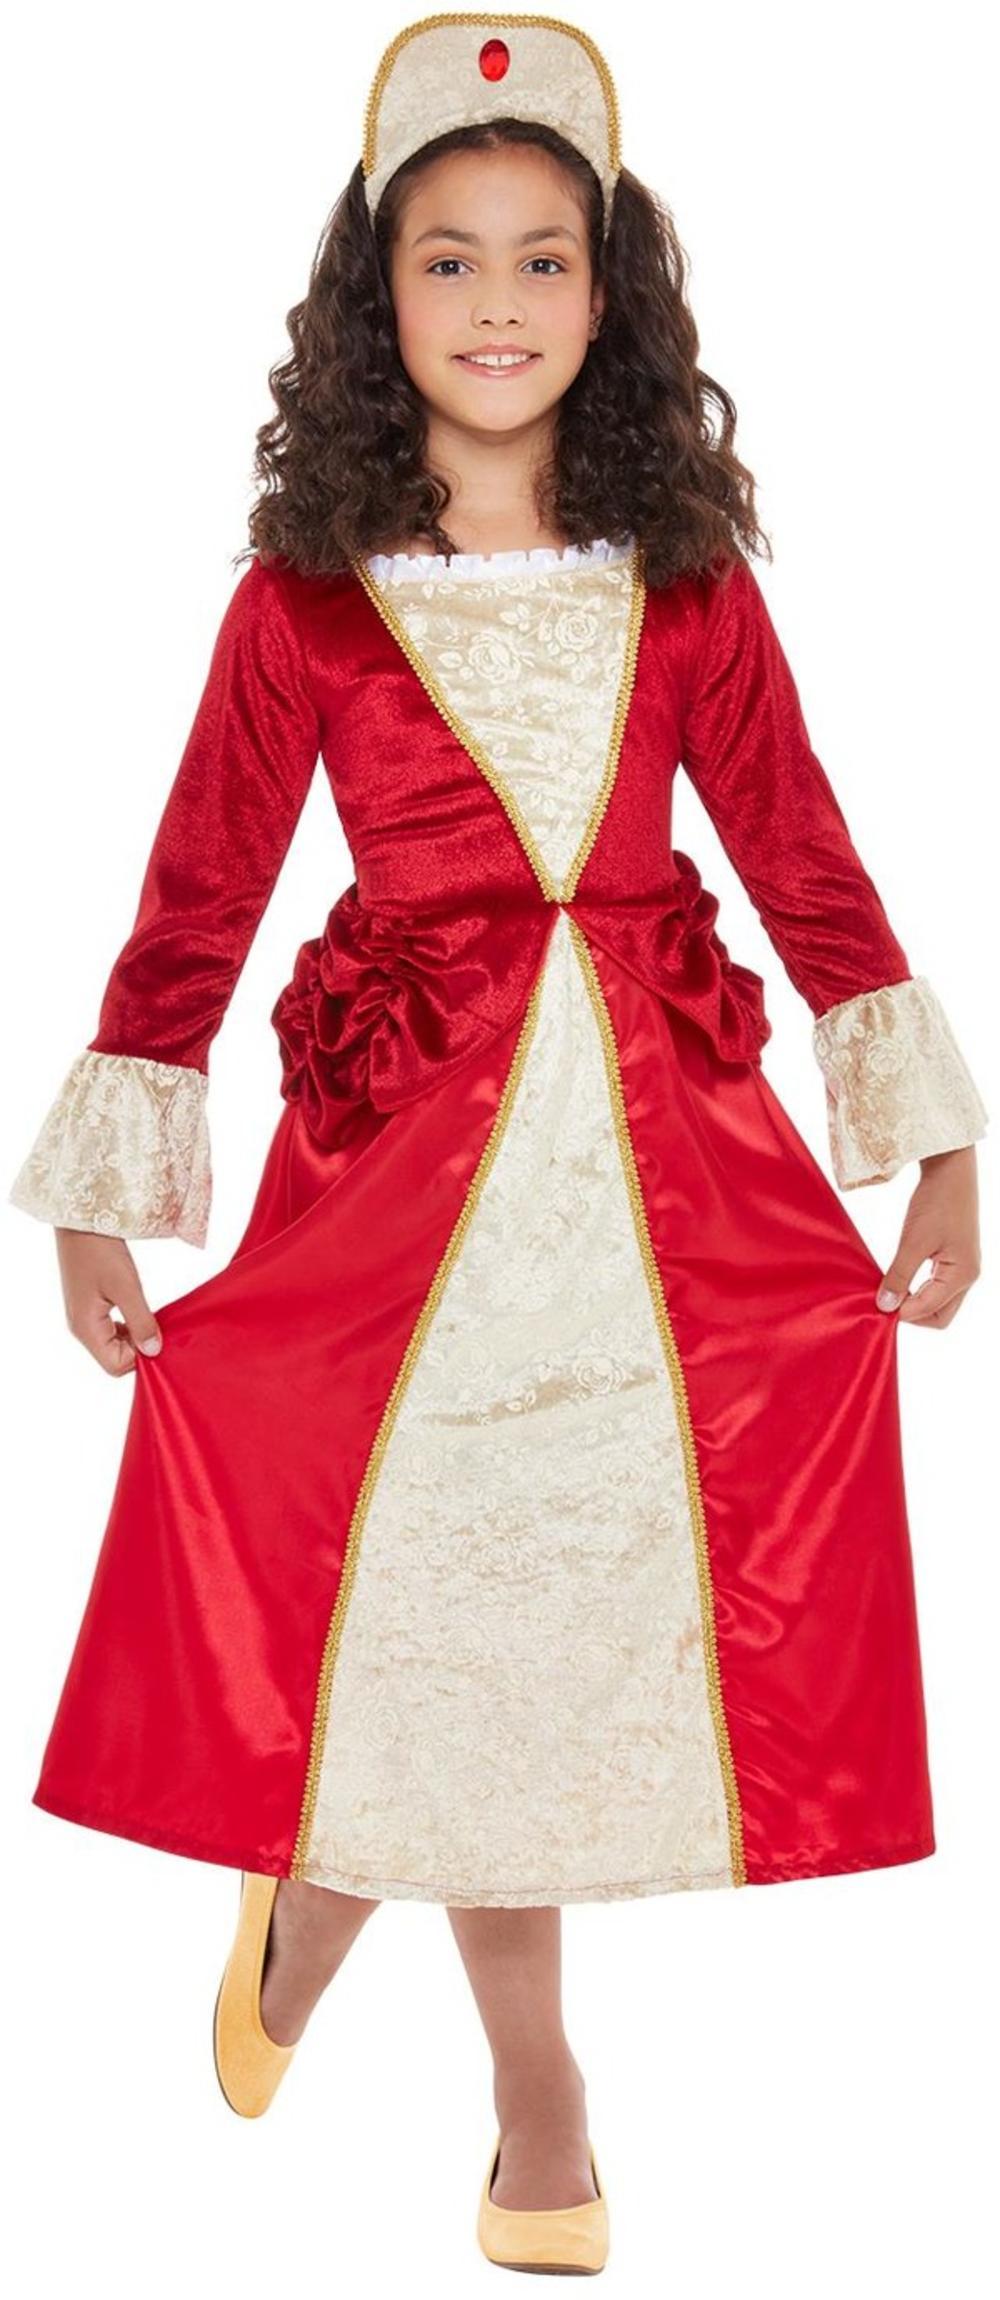 Tudor Princess Girls Fancy Dress Royal Medieval World Book Day Week Kids Costume